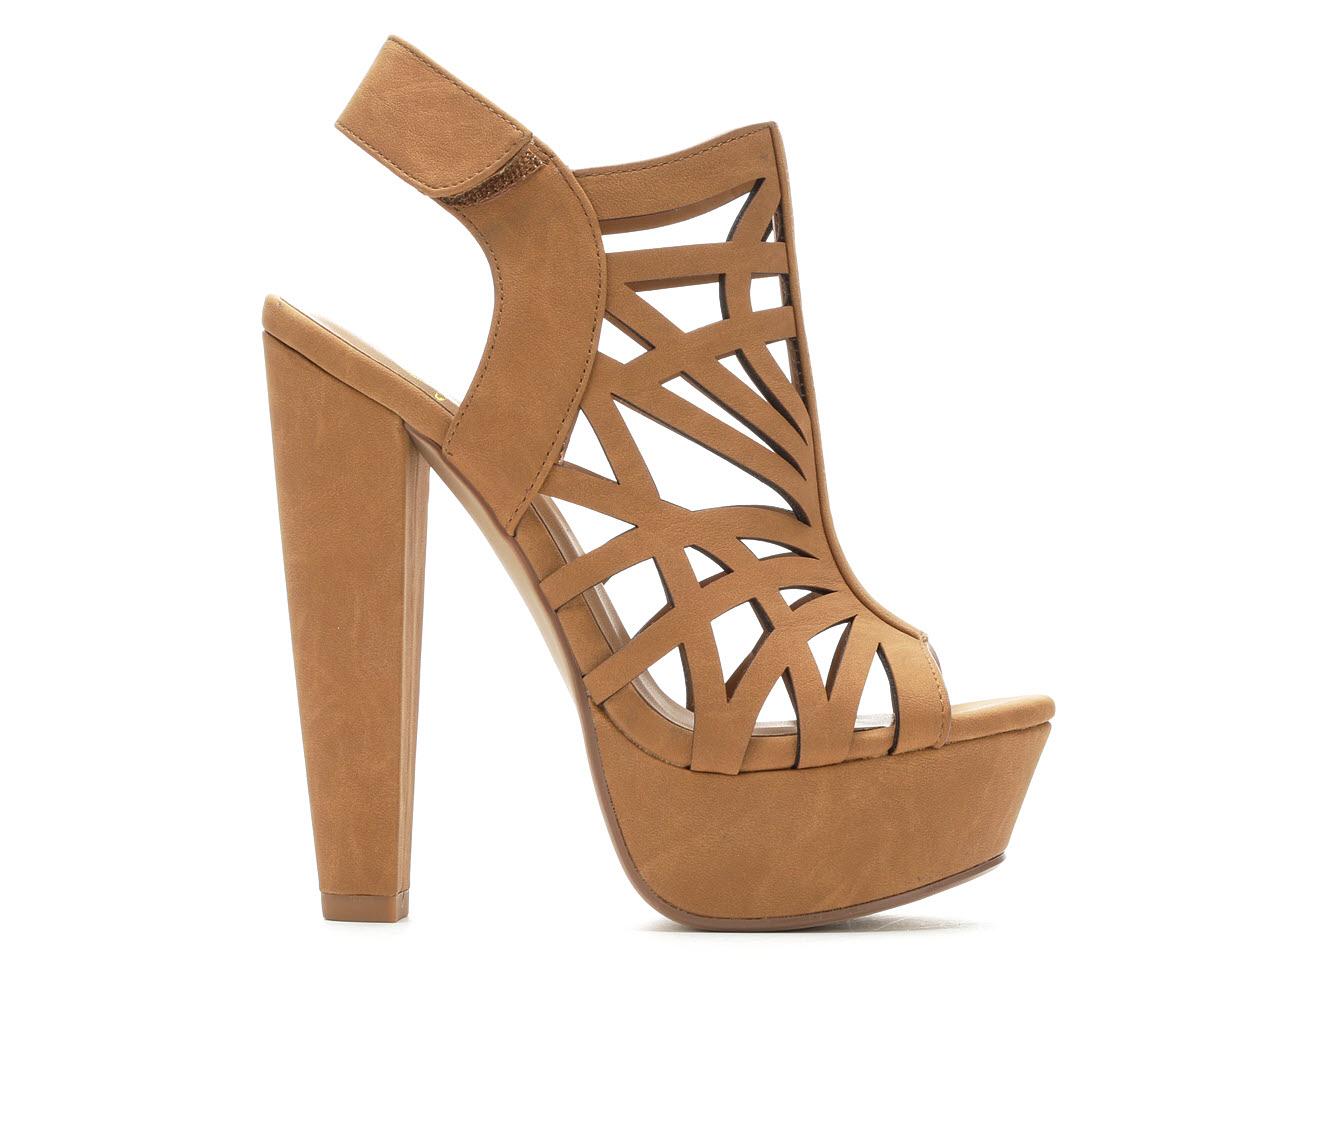 Delicious Factor Women's Dress Shoe (Beige Faux Leather)